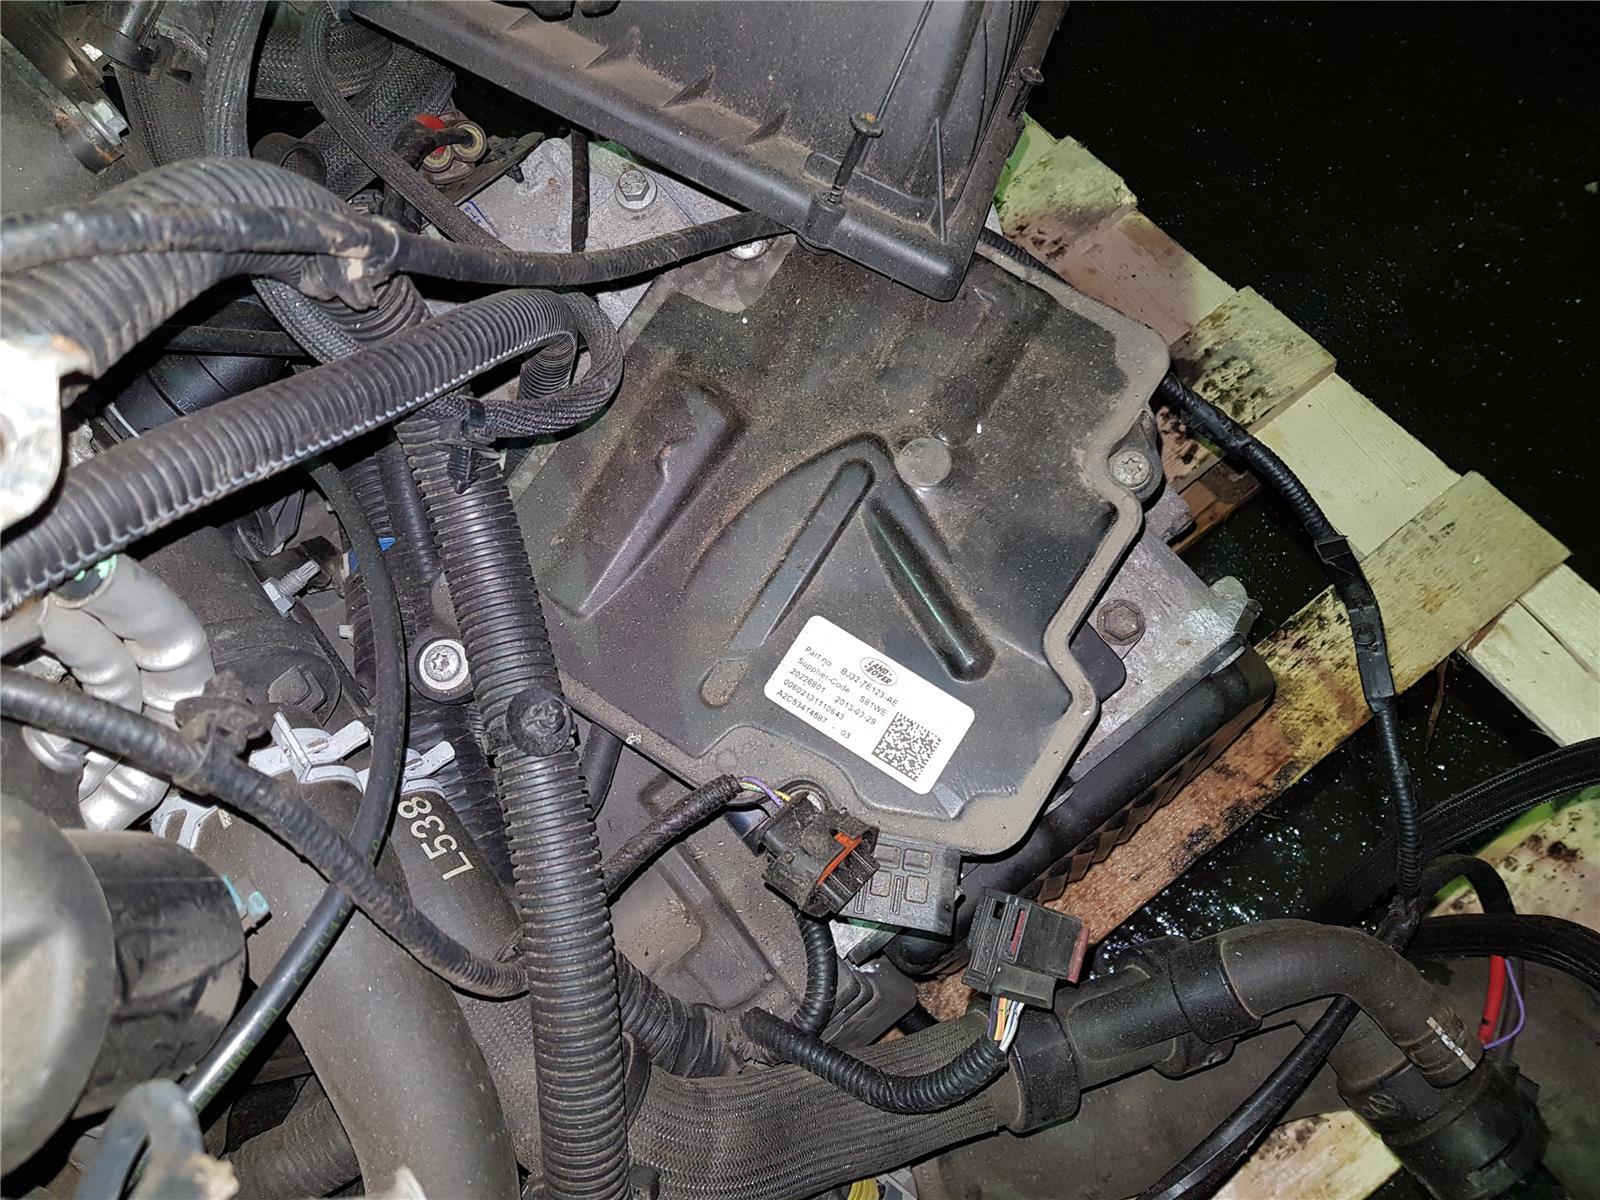 Land Rover Range Evoque 2011 To 2015 Engine Diesel Macau Electrical Wiring Code 2013 Mk1 Lv 22 Sd4 Dw12 Te5